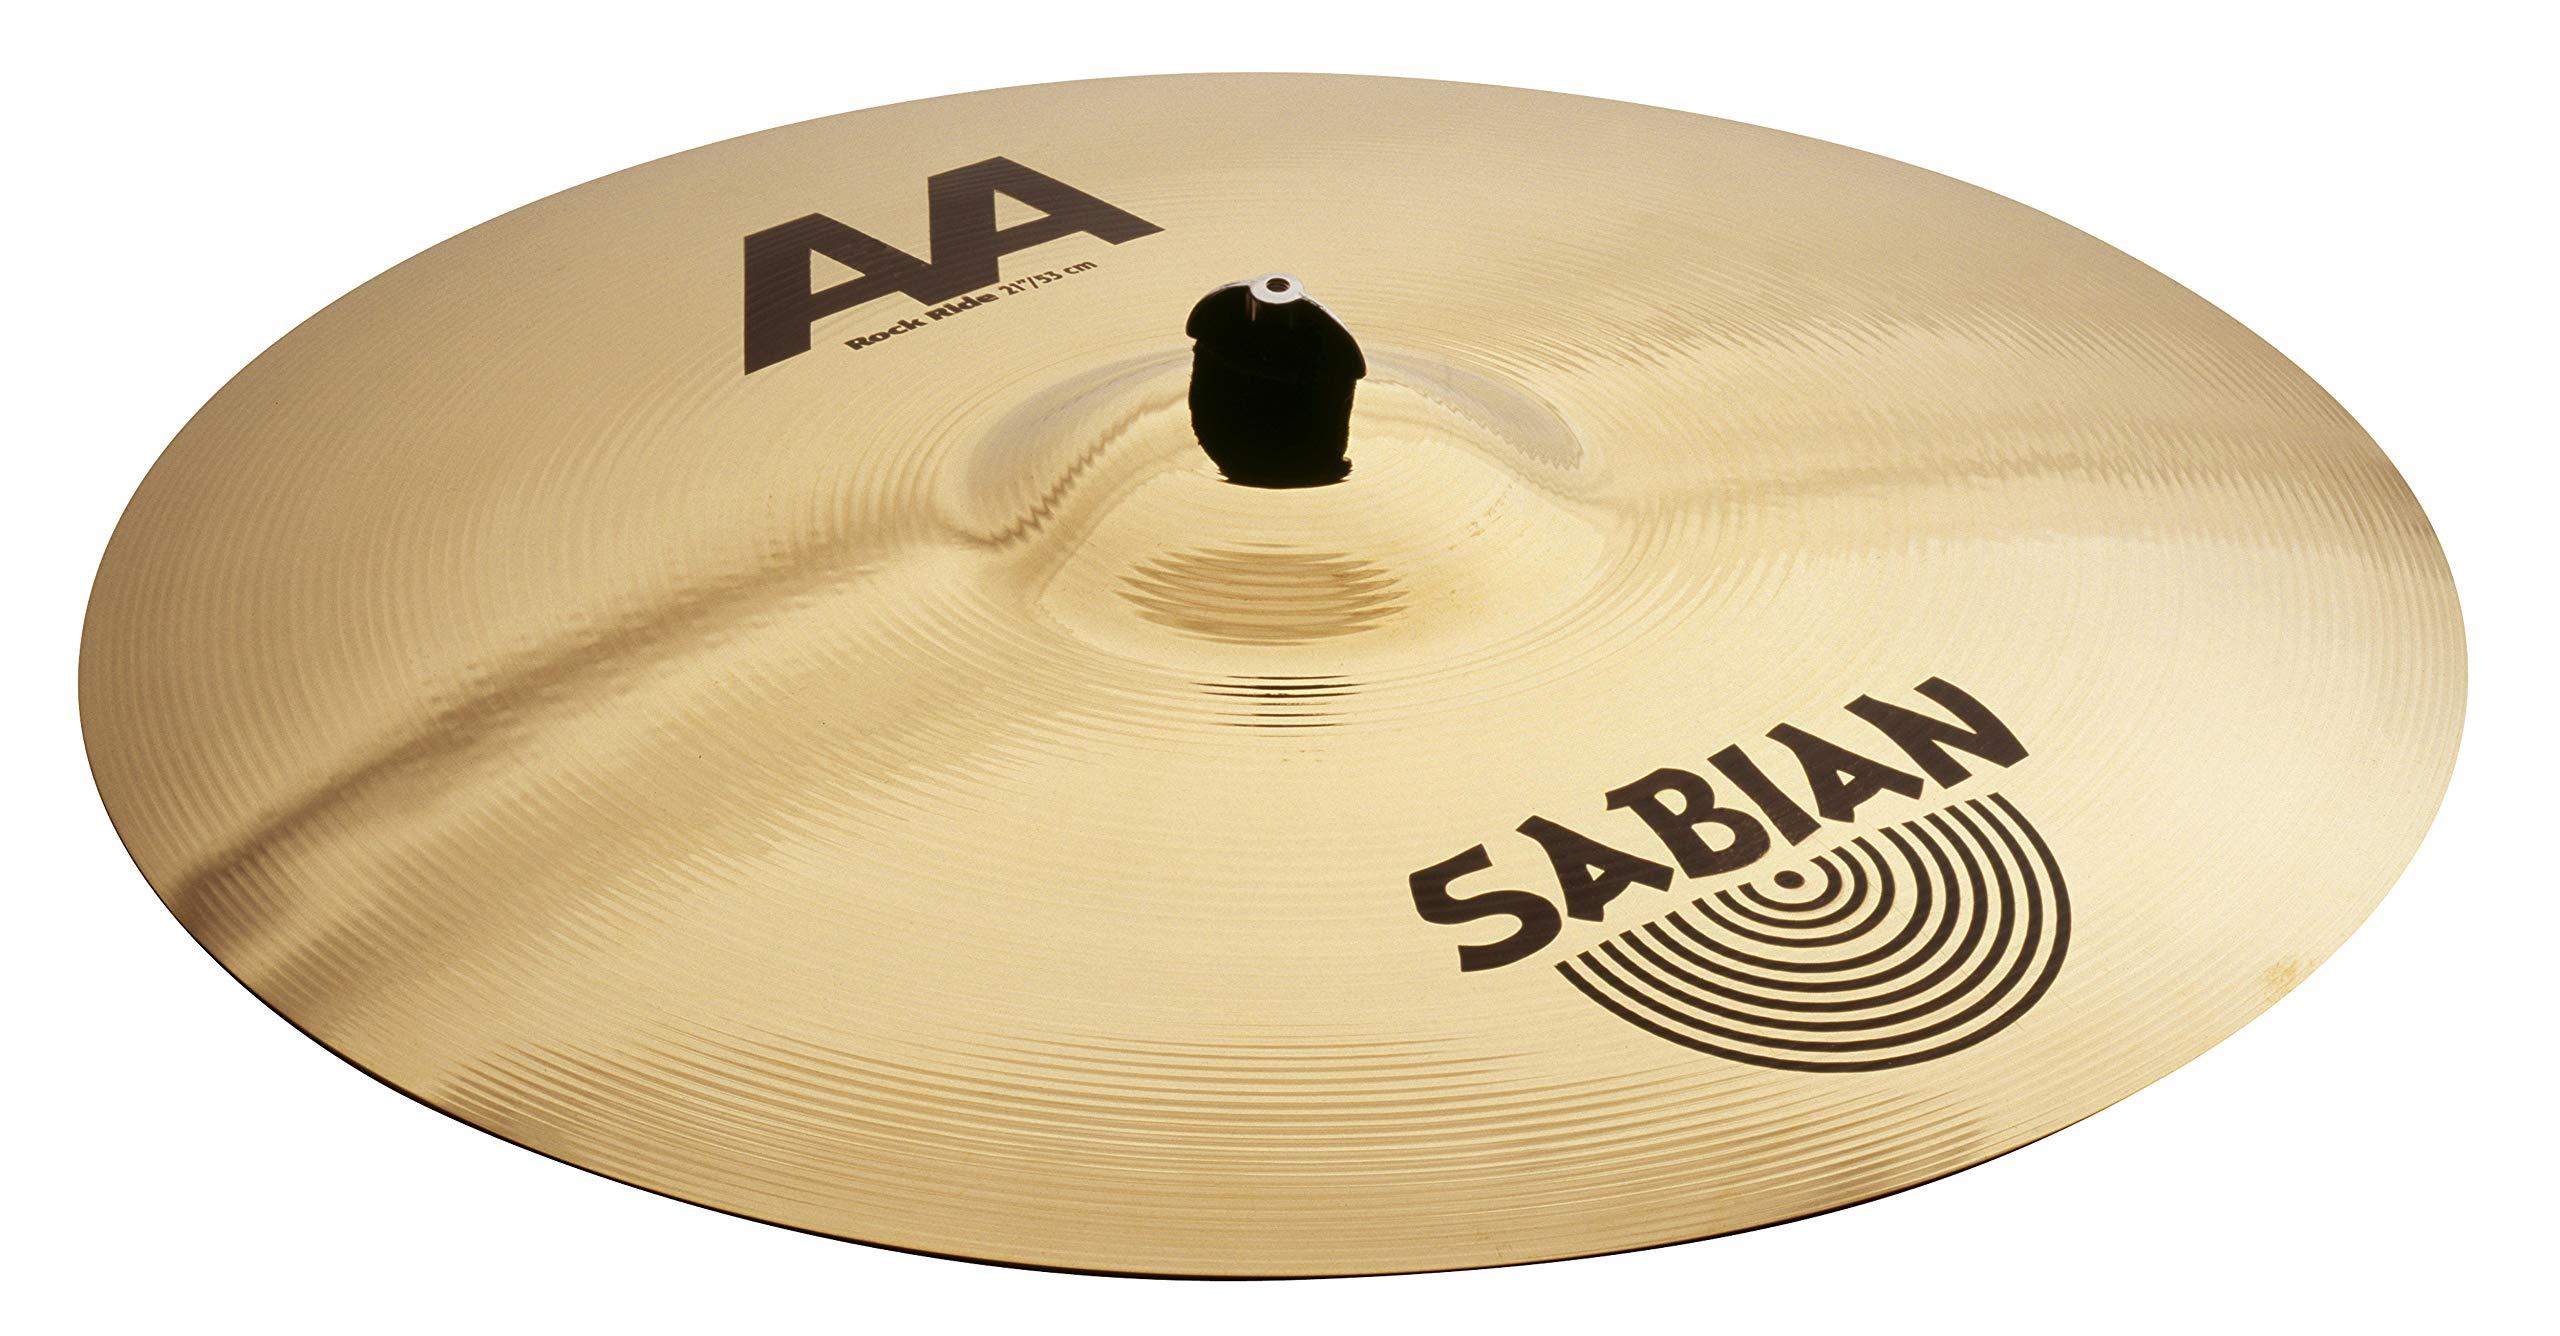 Sabian AA 21'' Rock Ride Cymbal, Brilliant Finish. by Sabian